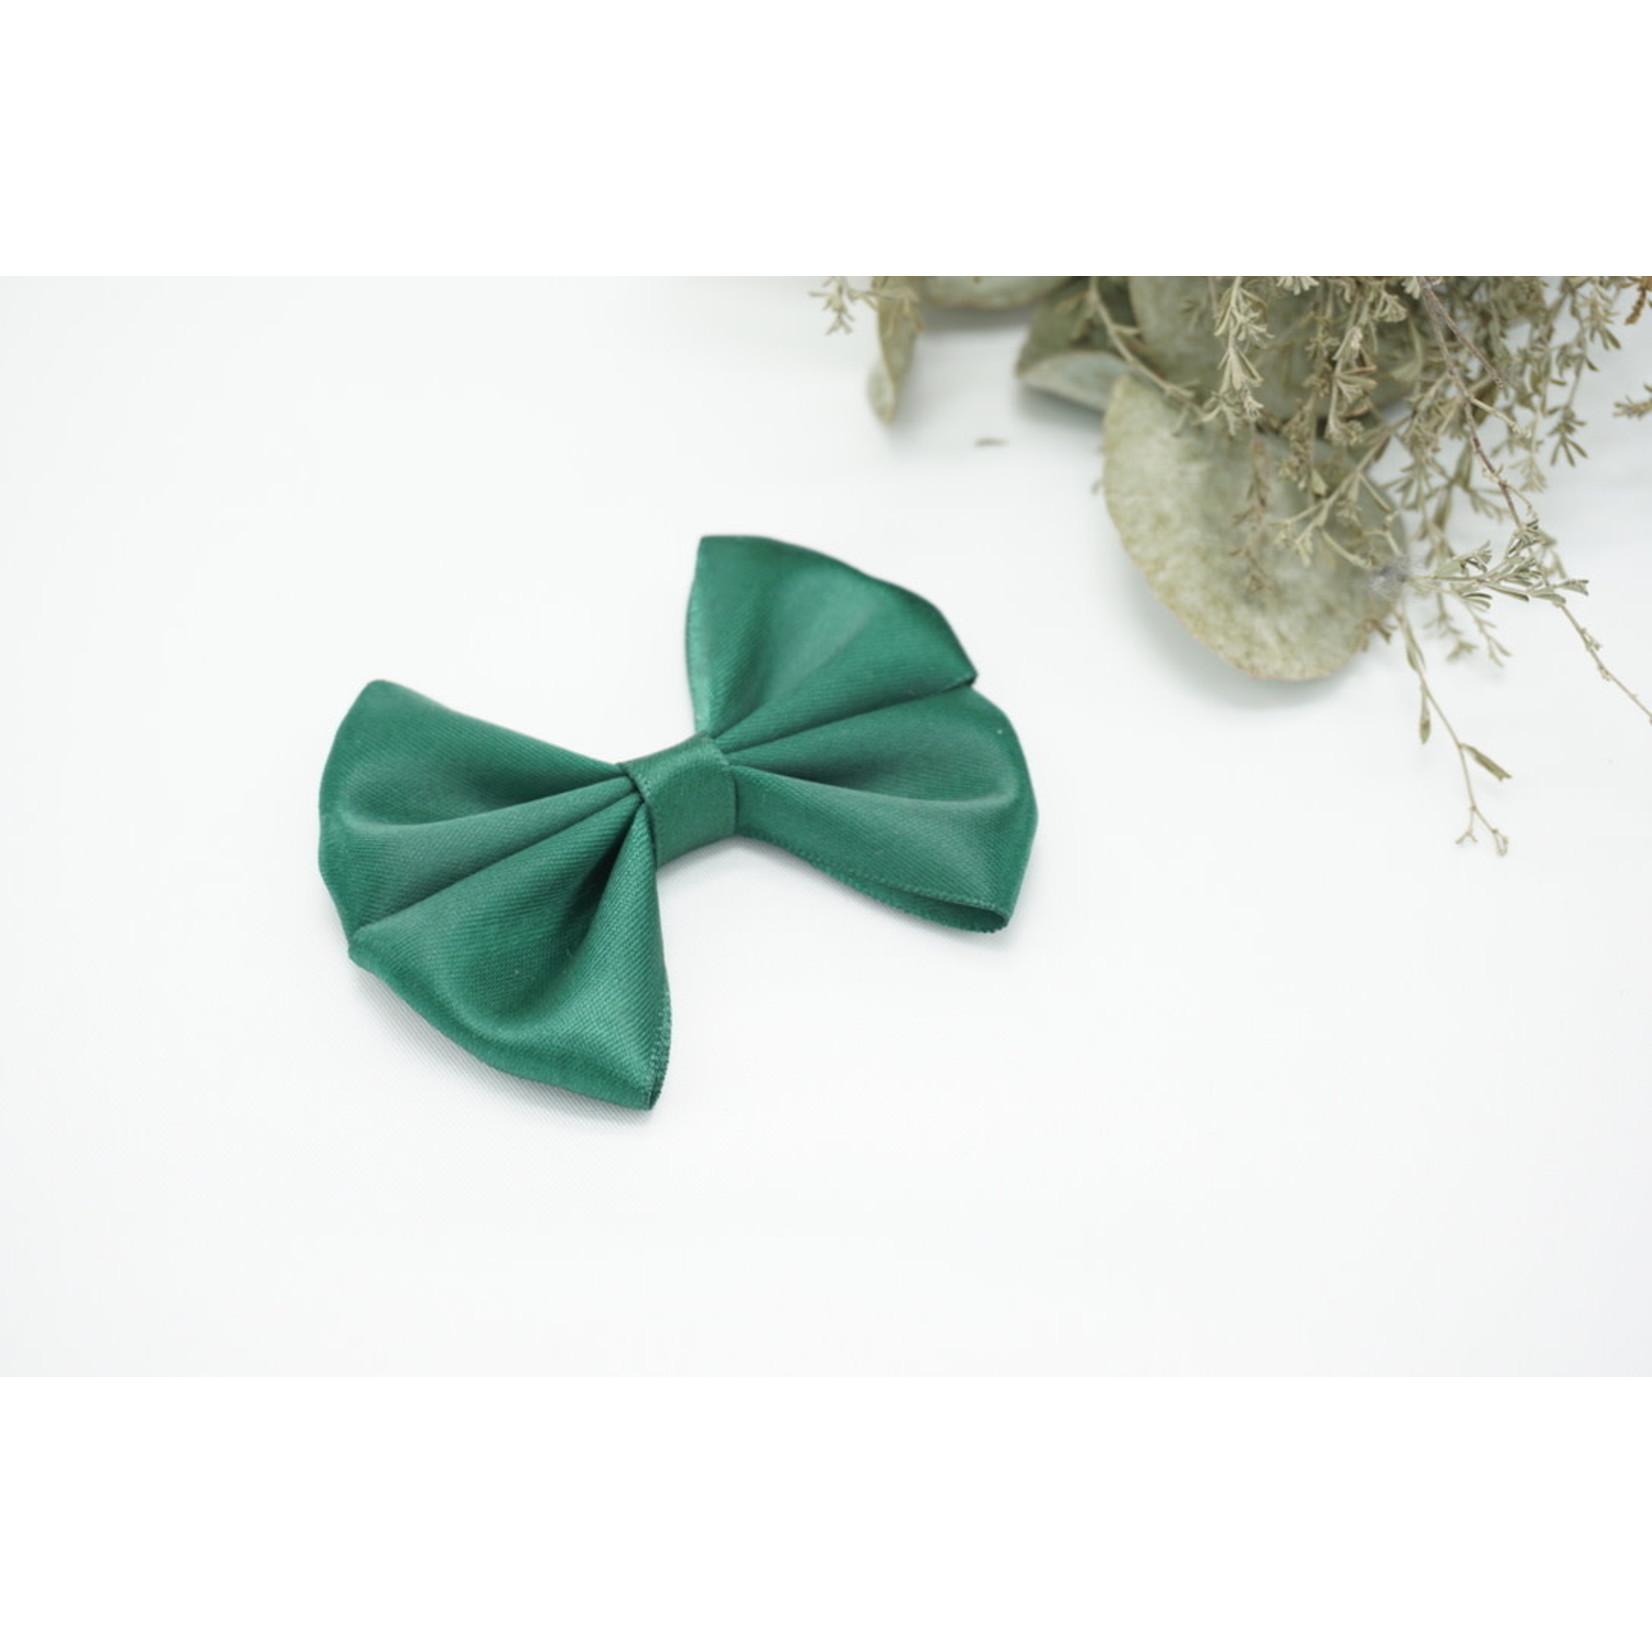 Petite Zara Satin Bow - Green